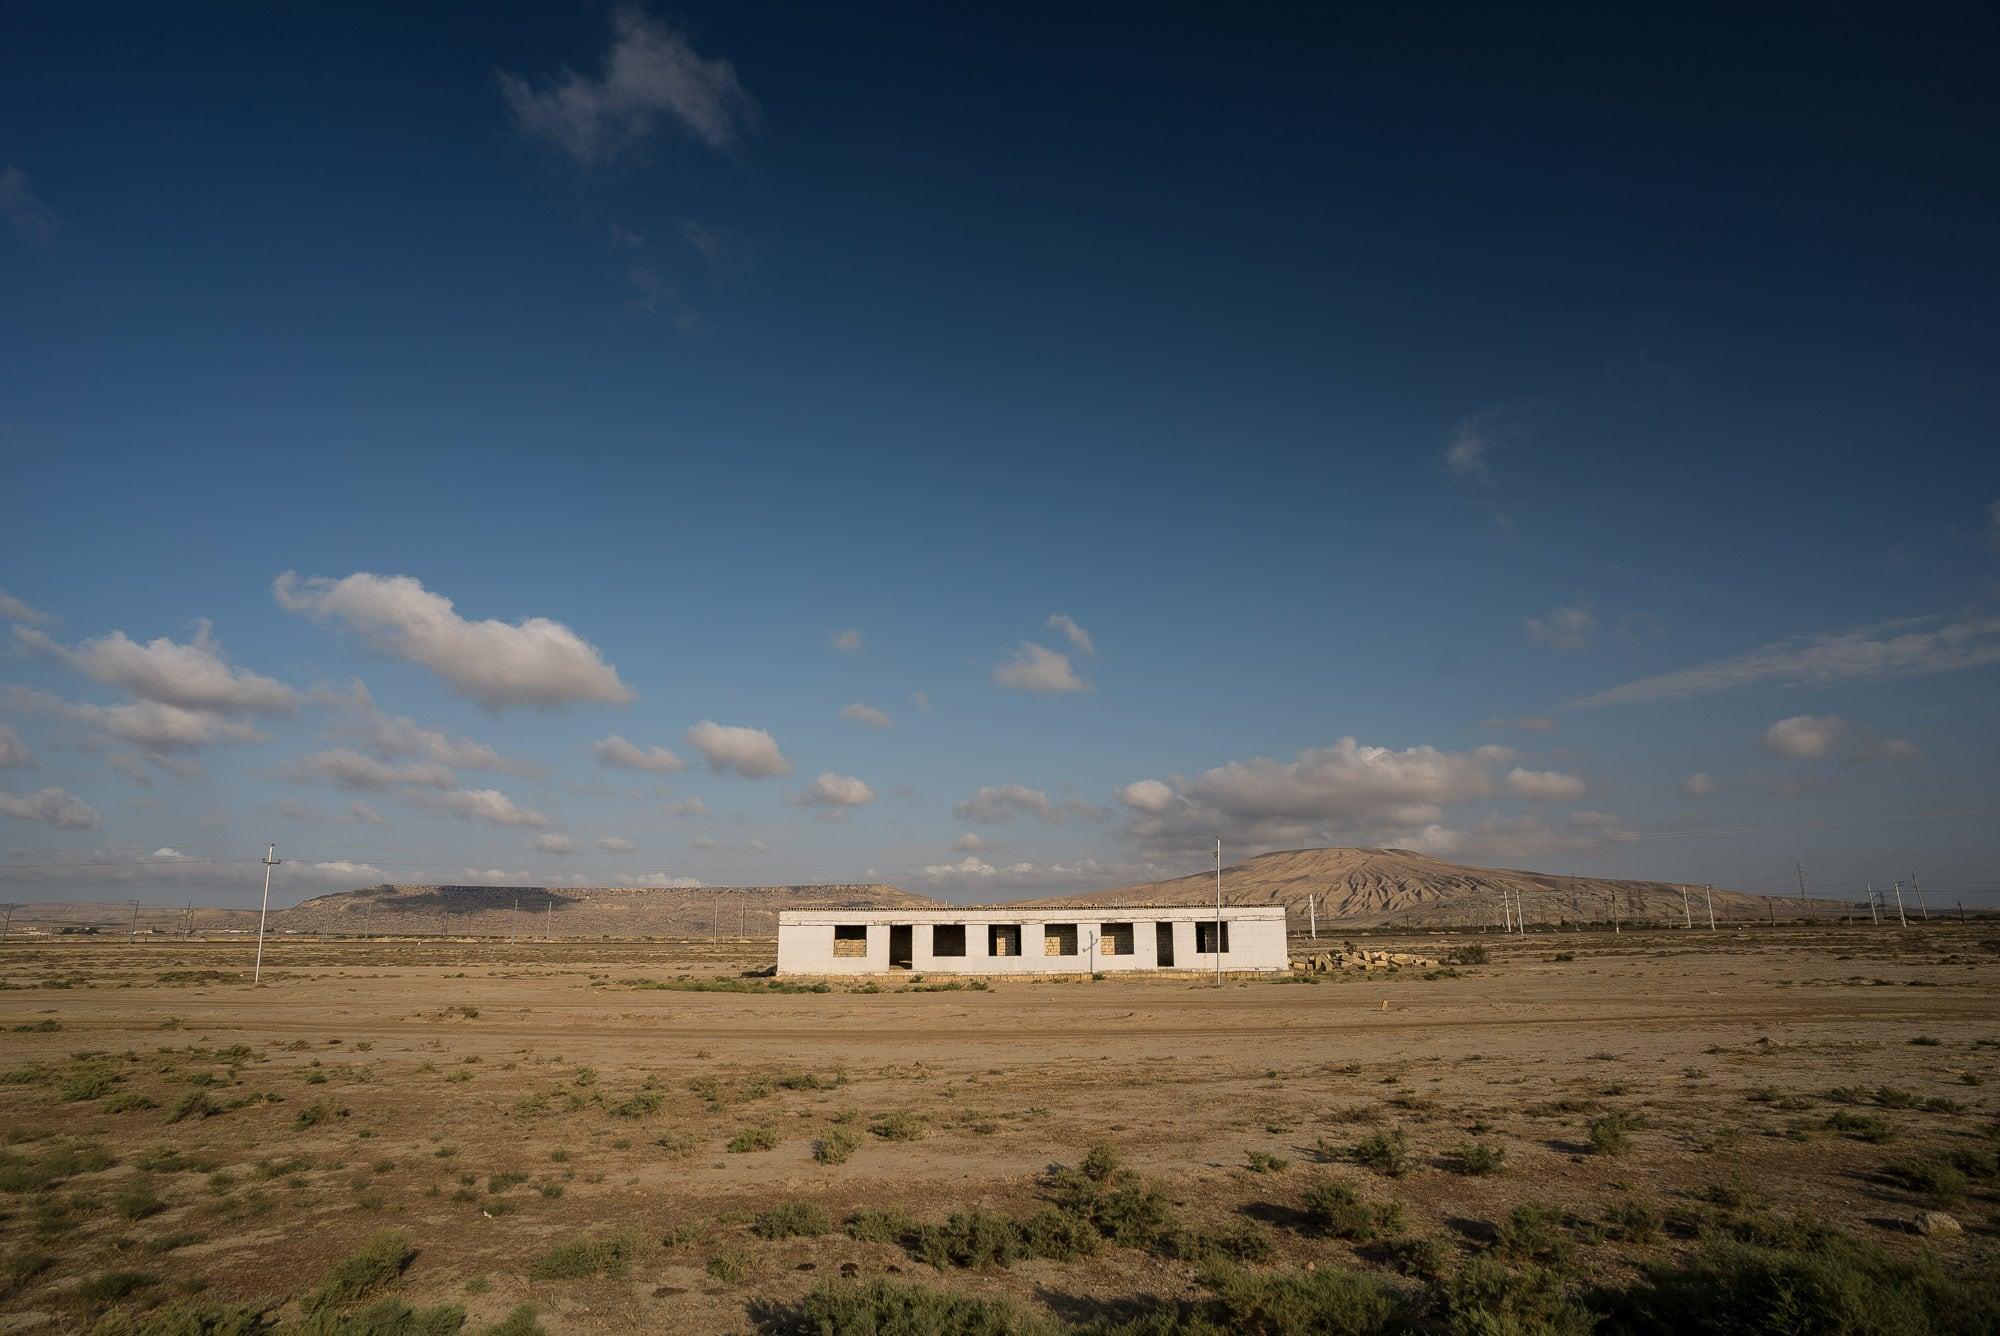 building in the semi-desert